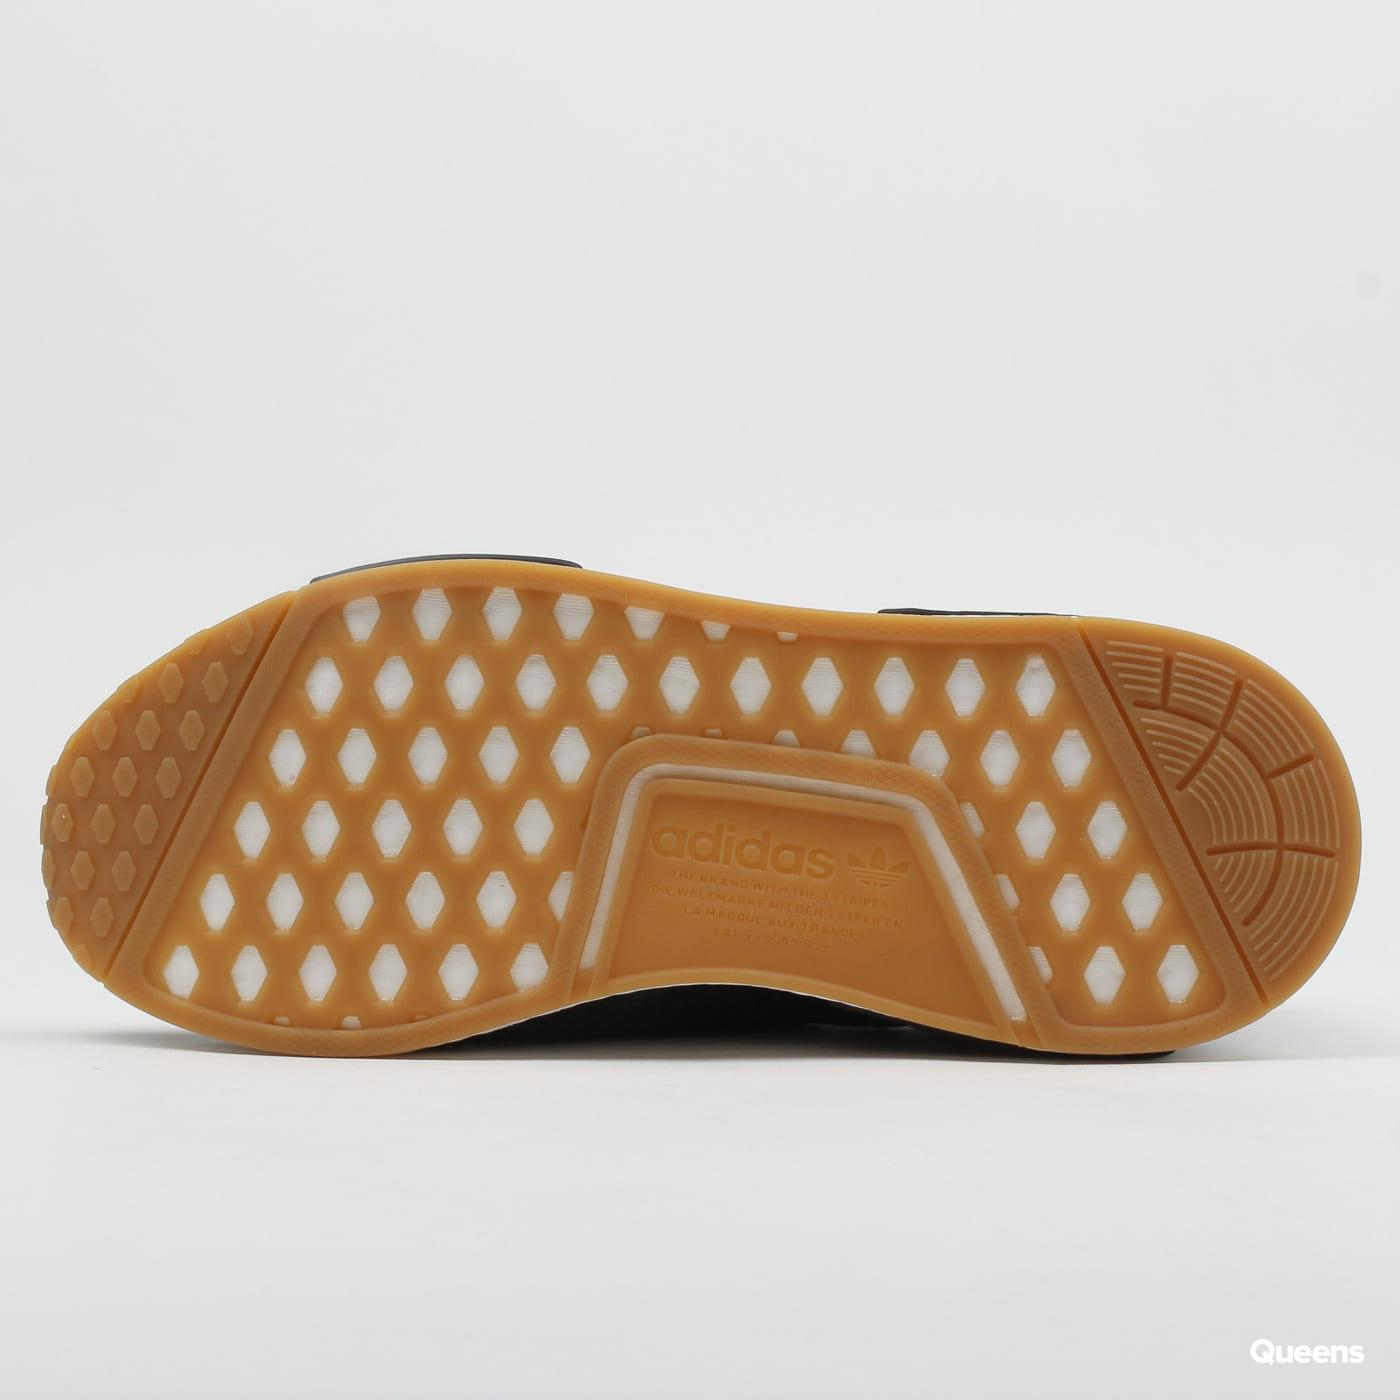 adidas Originals NMD_R1 black / anthracite / white